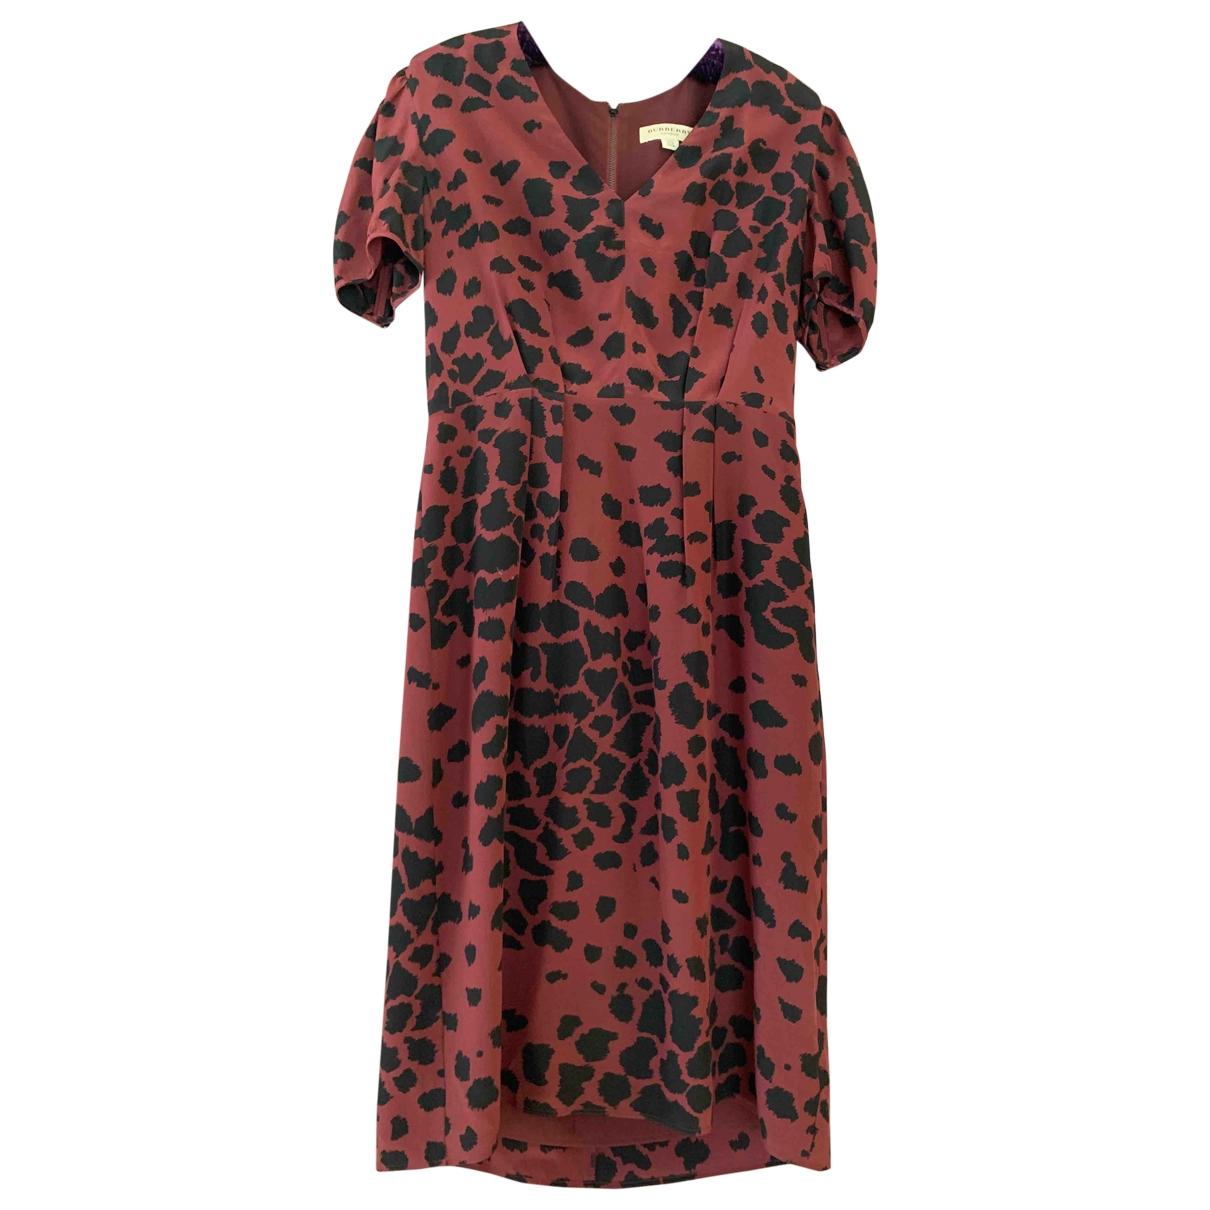 Burberry \N Burgundy Silk dress for Women 8 UK